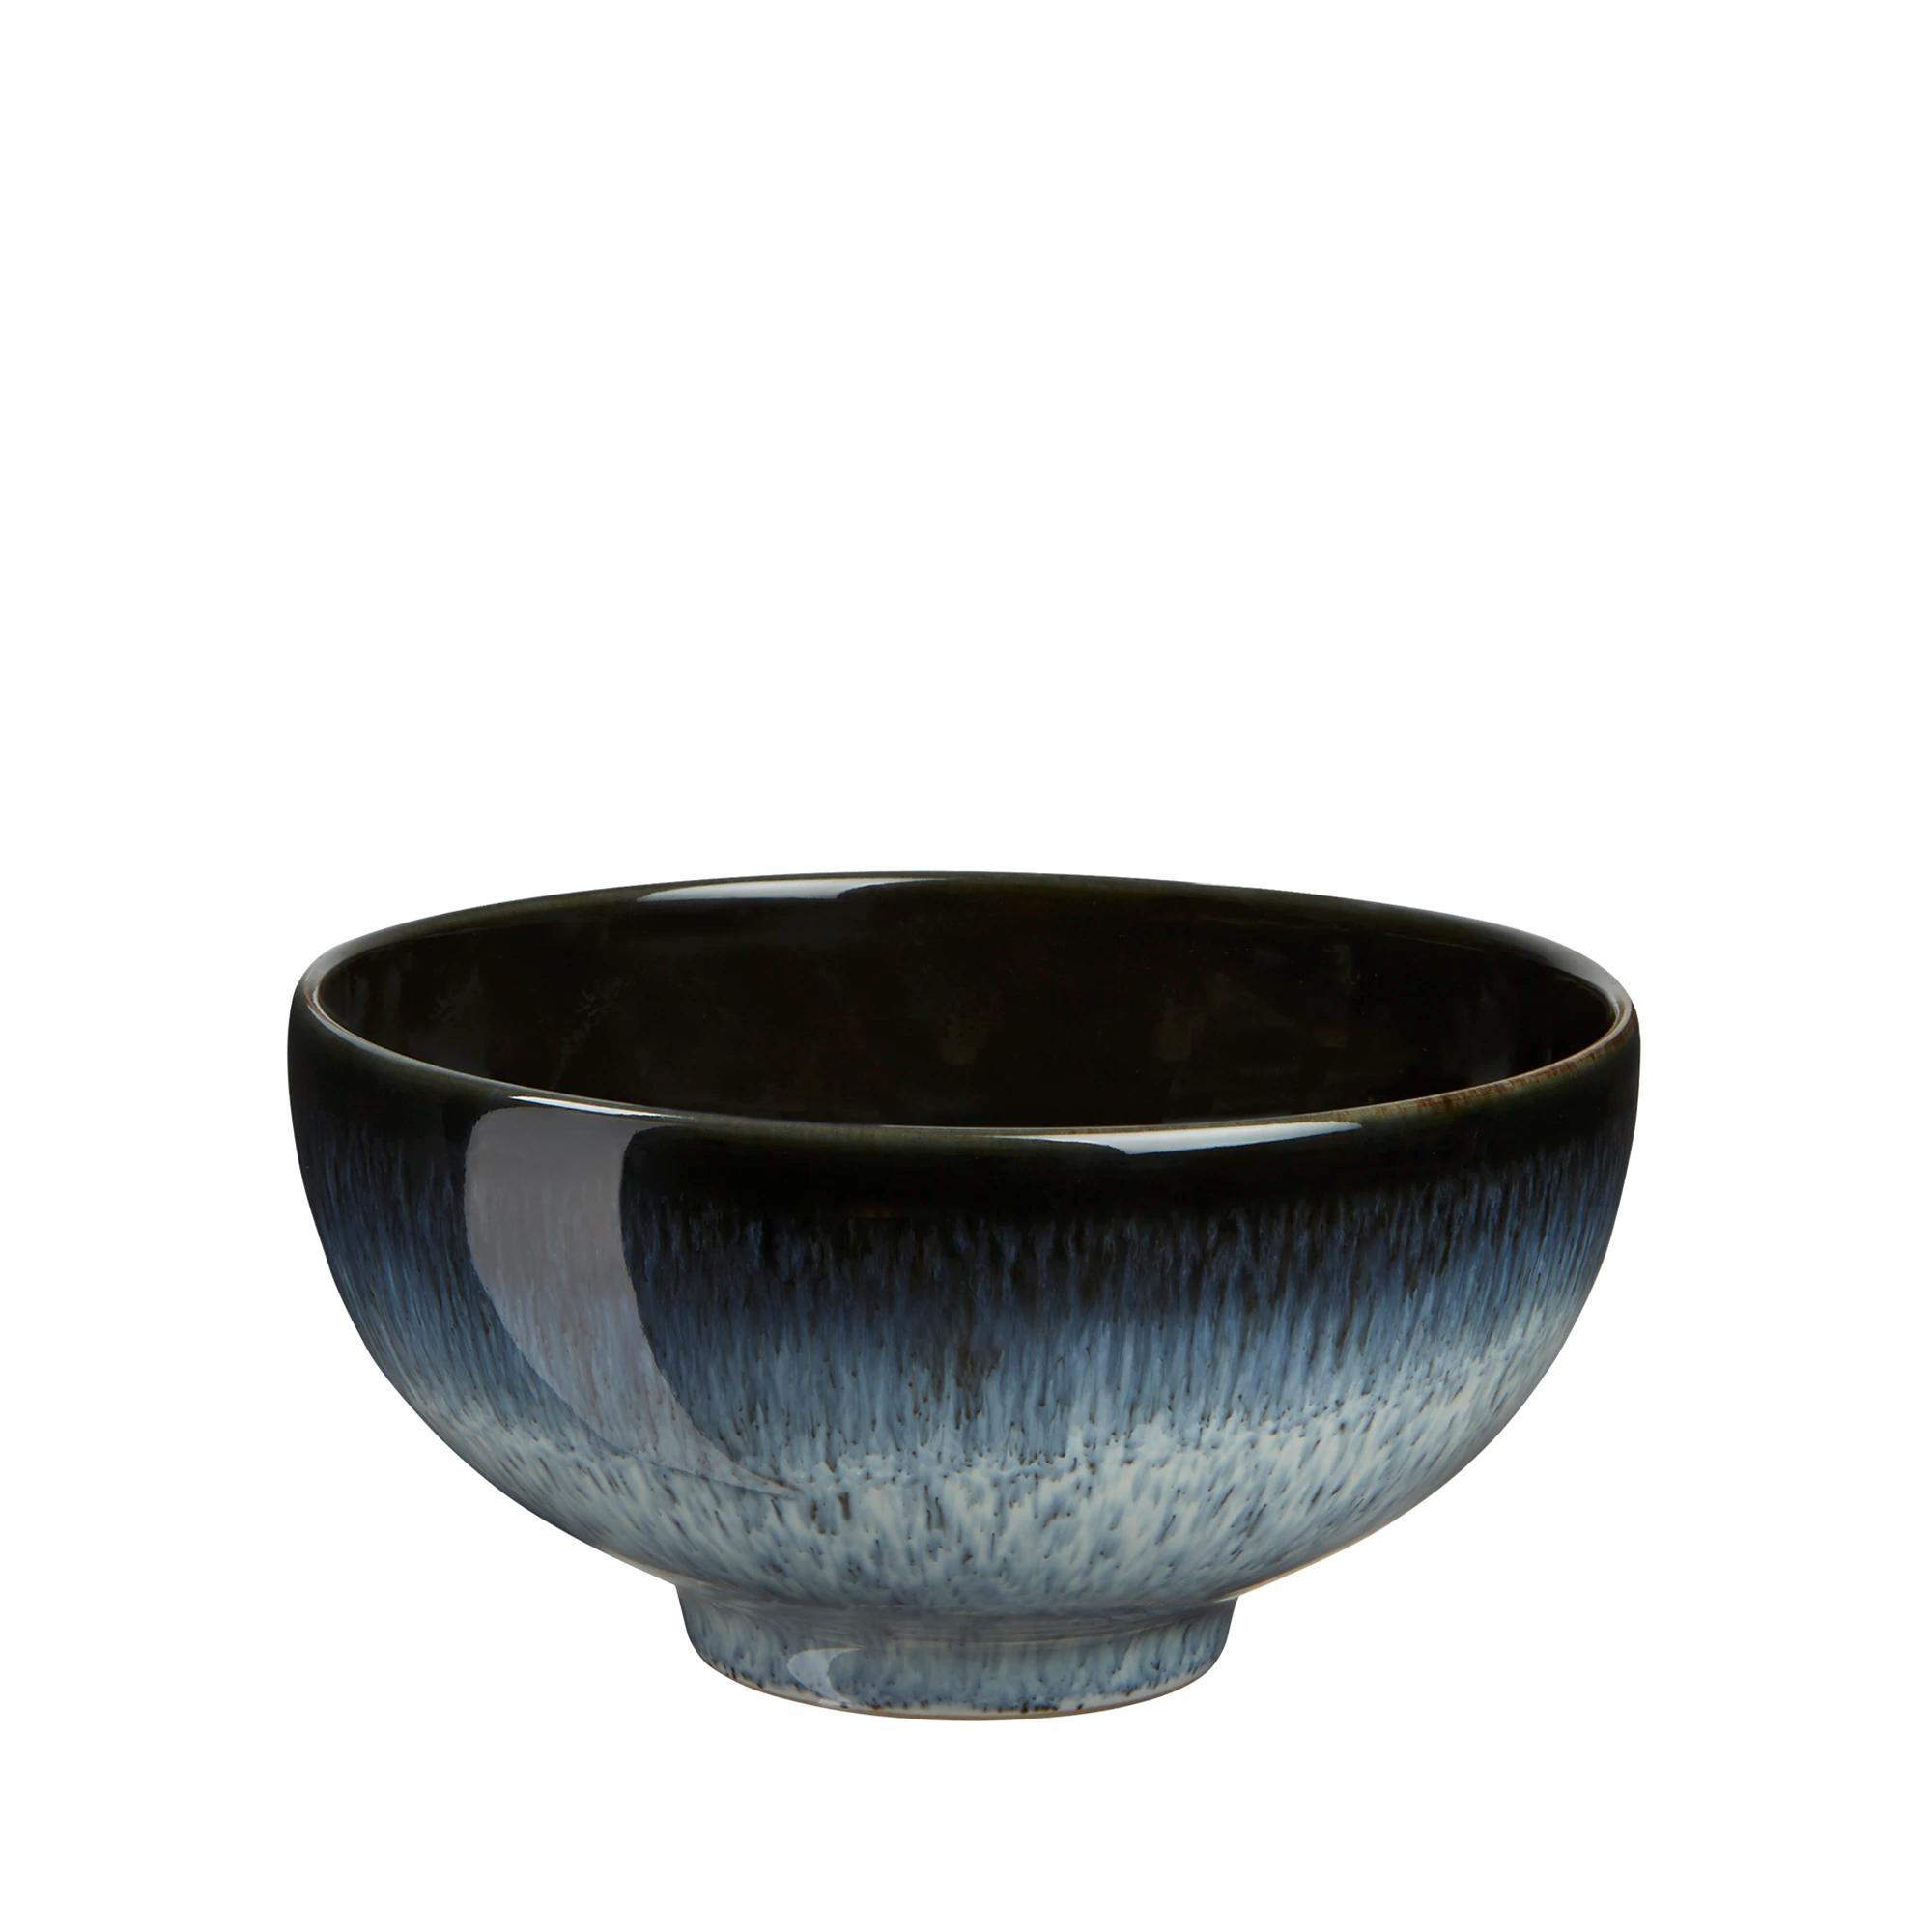 Denby Halo Rice Bowl